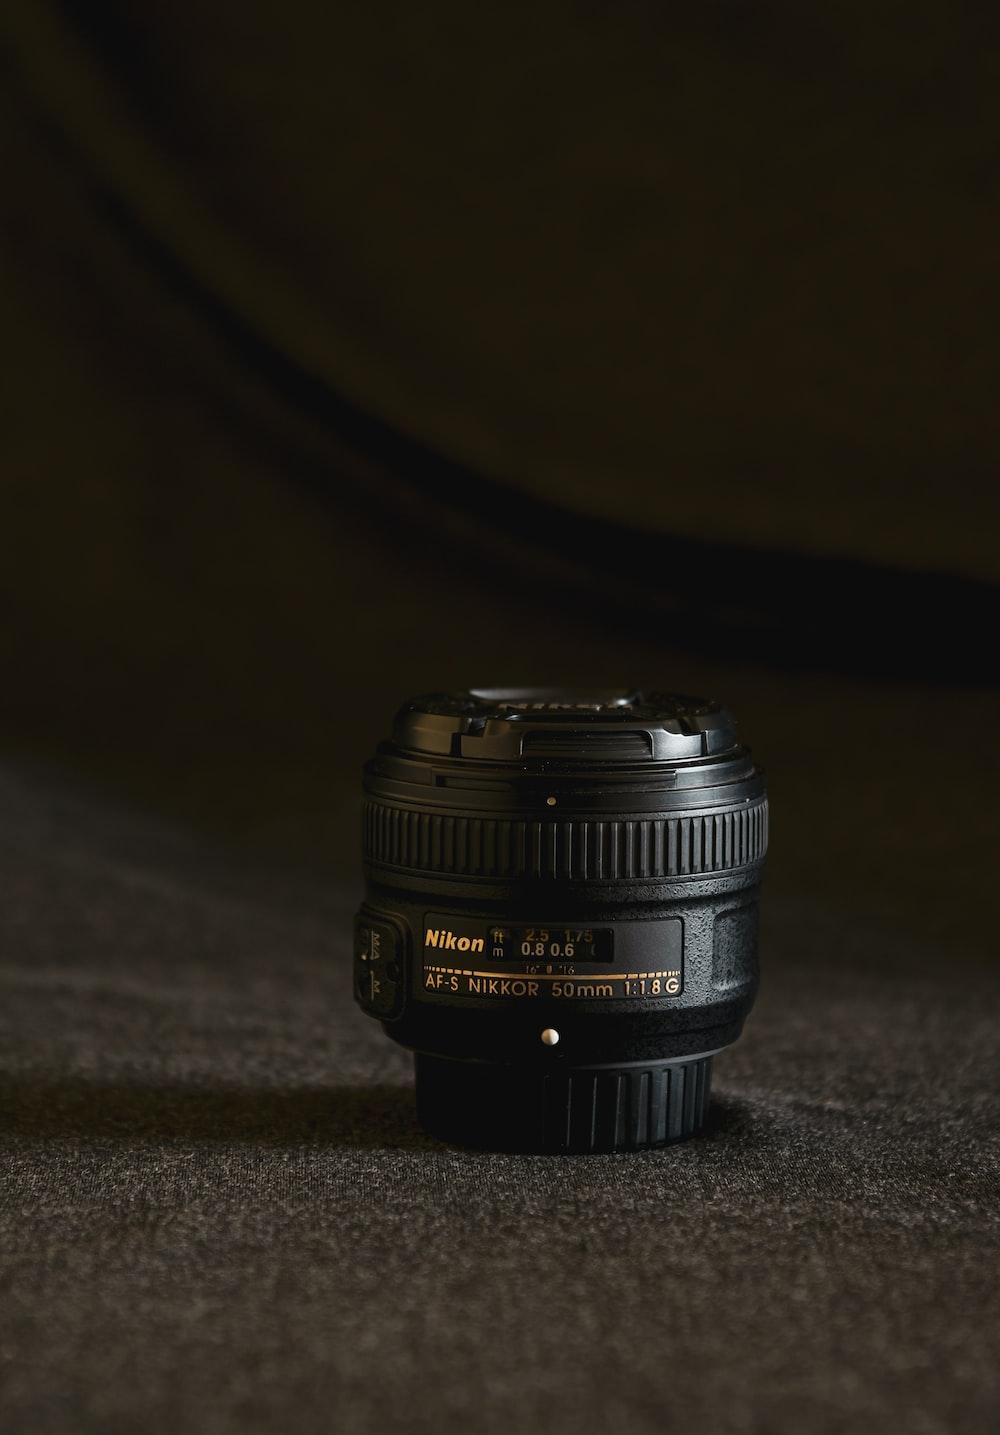 black nikon camera lens on gray textile